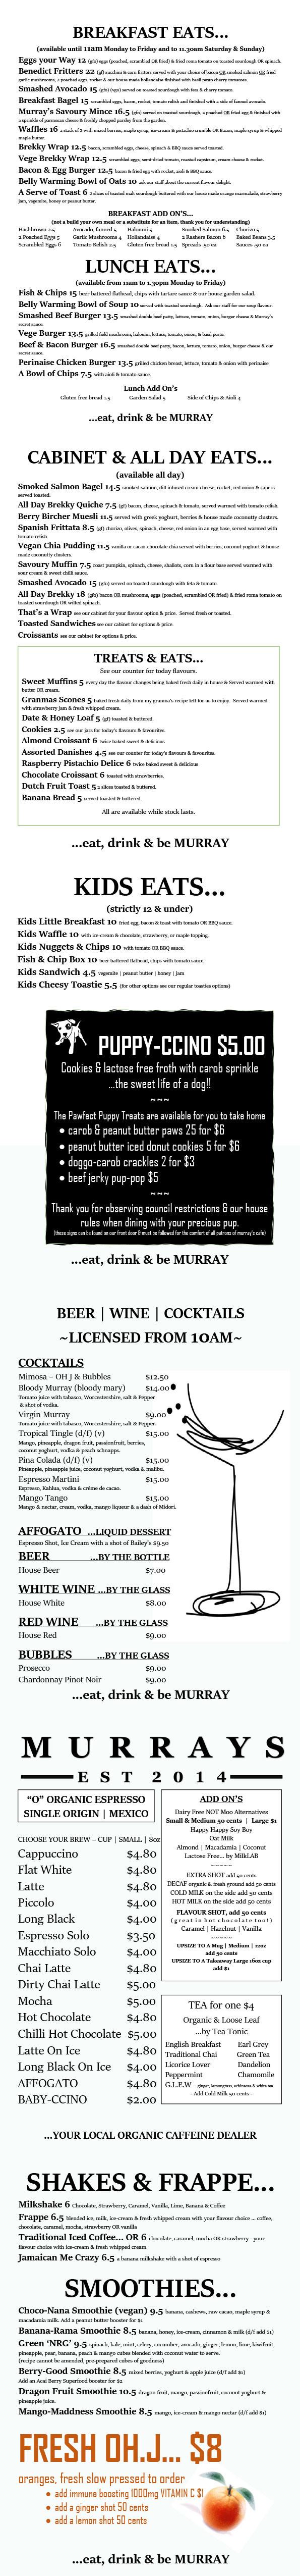 Murrays-menu-may-20.jpg